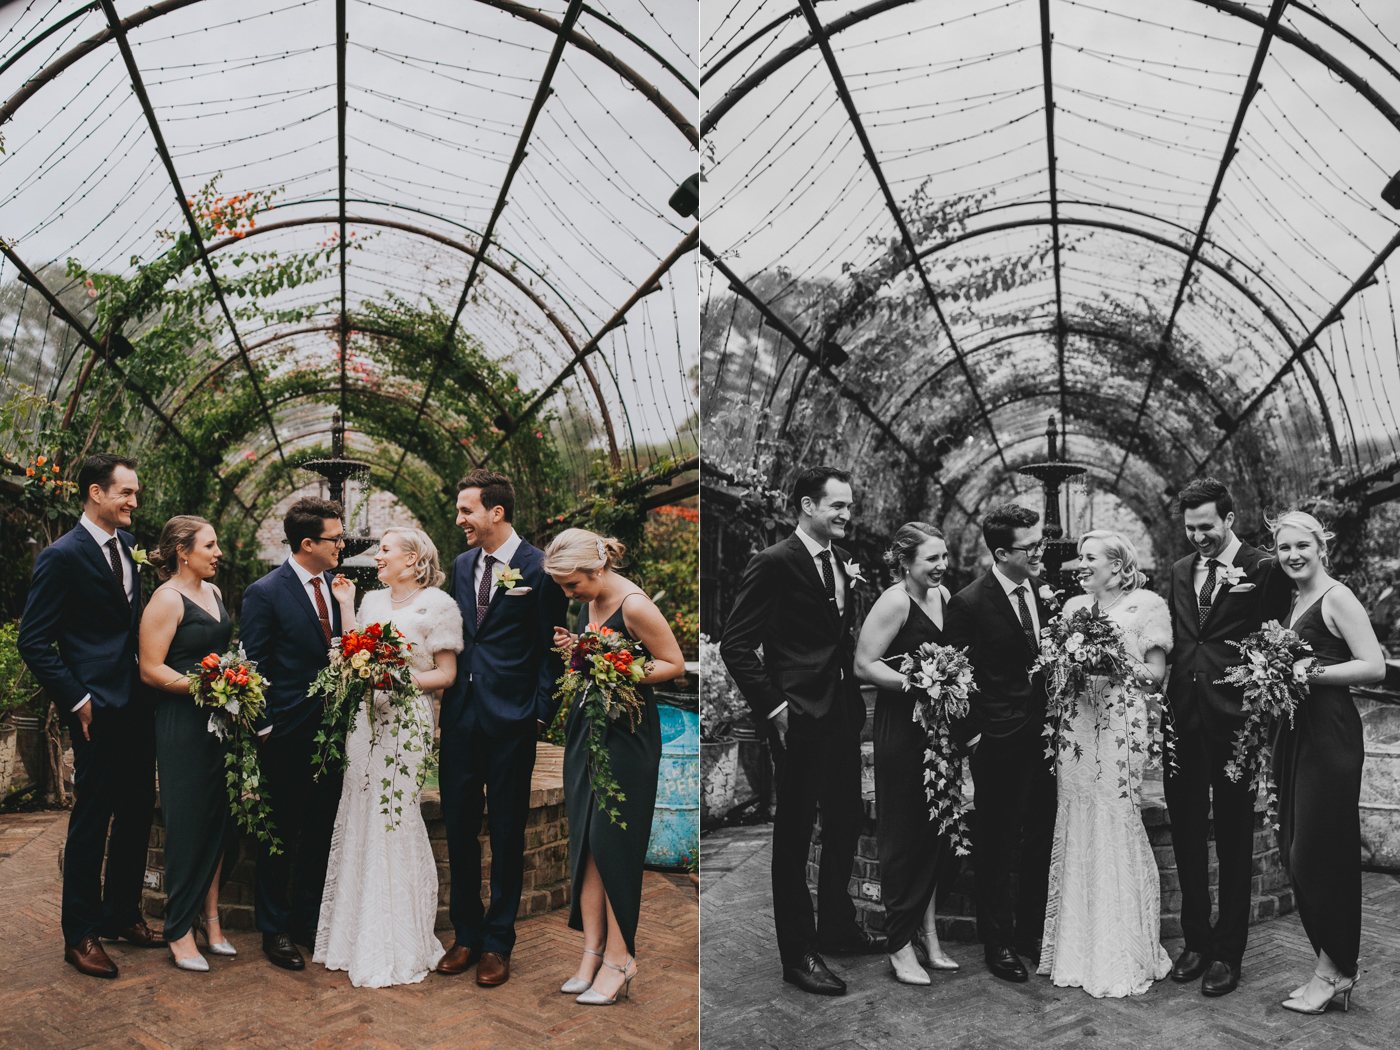 Jo & Tom Wedding - The Grounds of Alexandria - Samantha Heather Photography-201.jpg